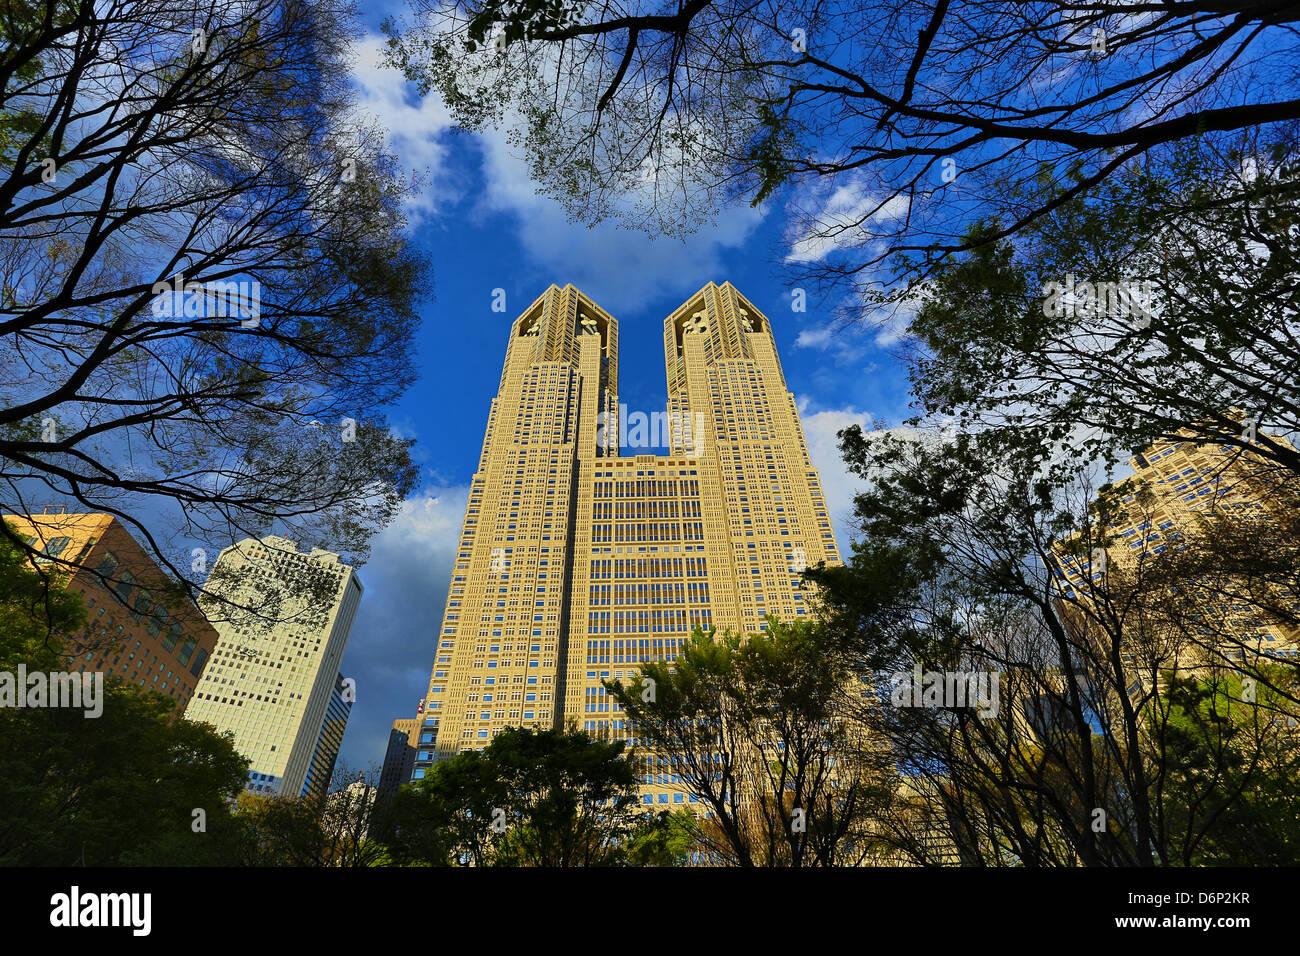 Tokyo Metropolitan Government Buidlings in Shinjuku, Tokyo, Japan - Stock Image